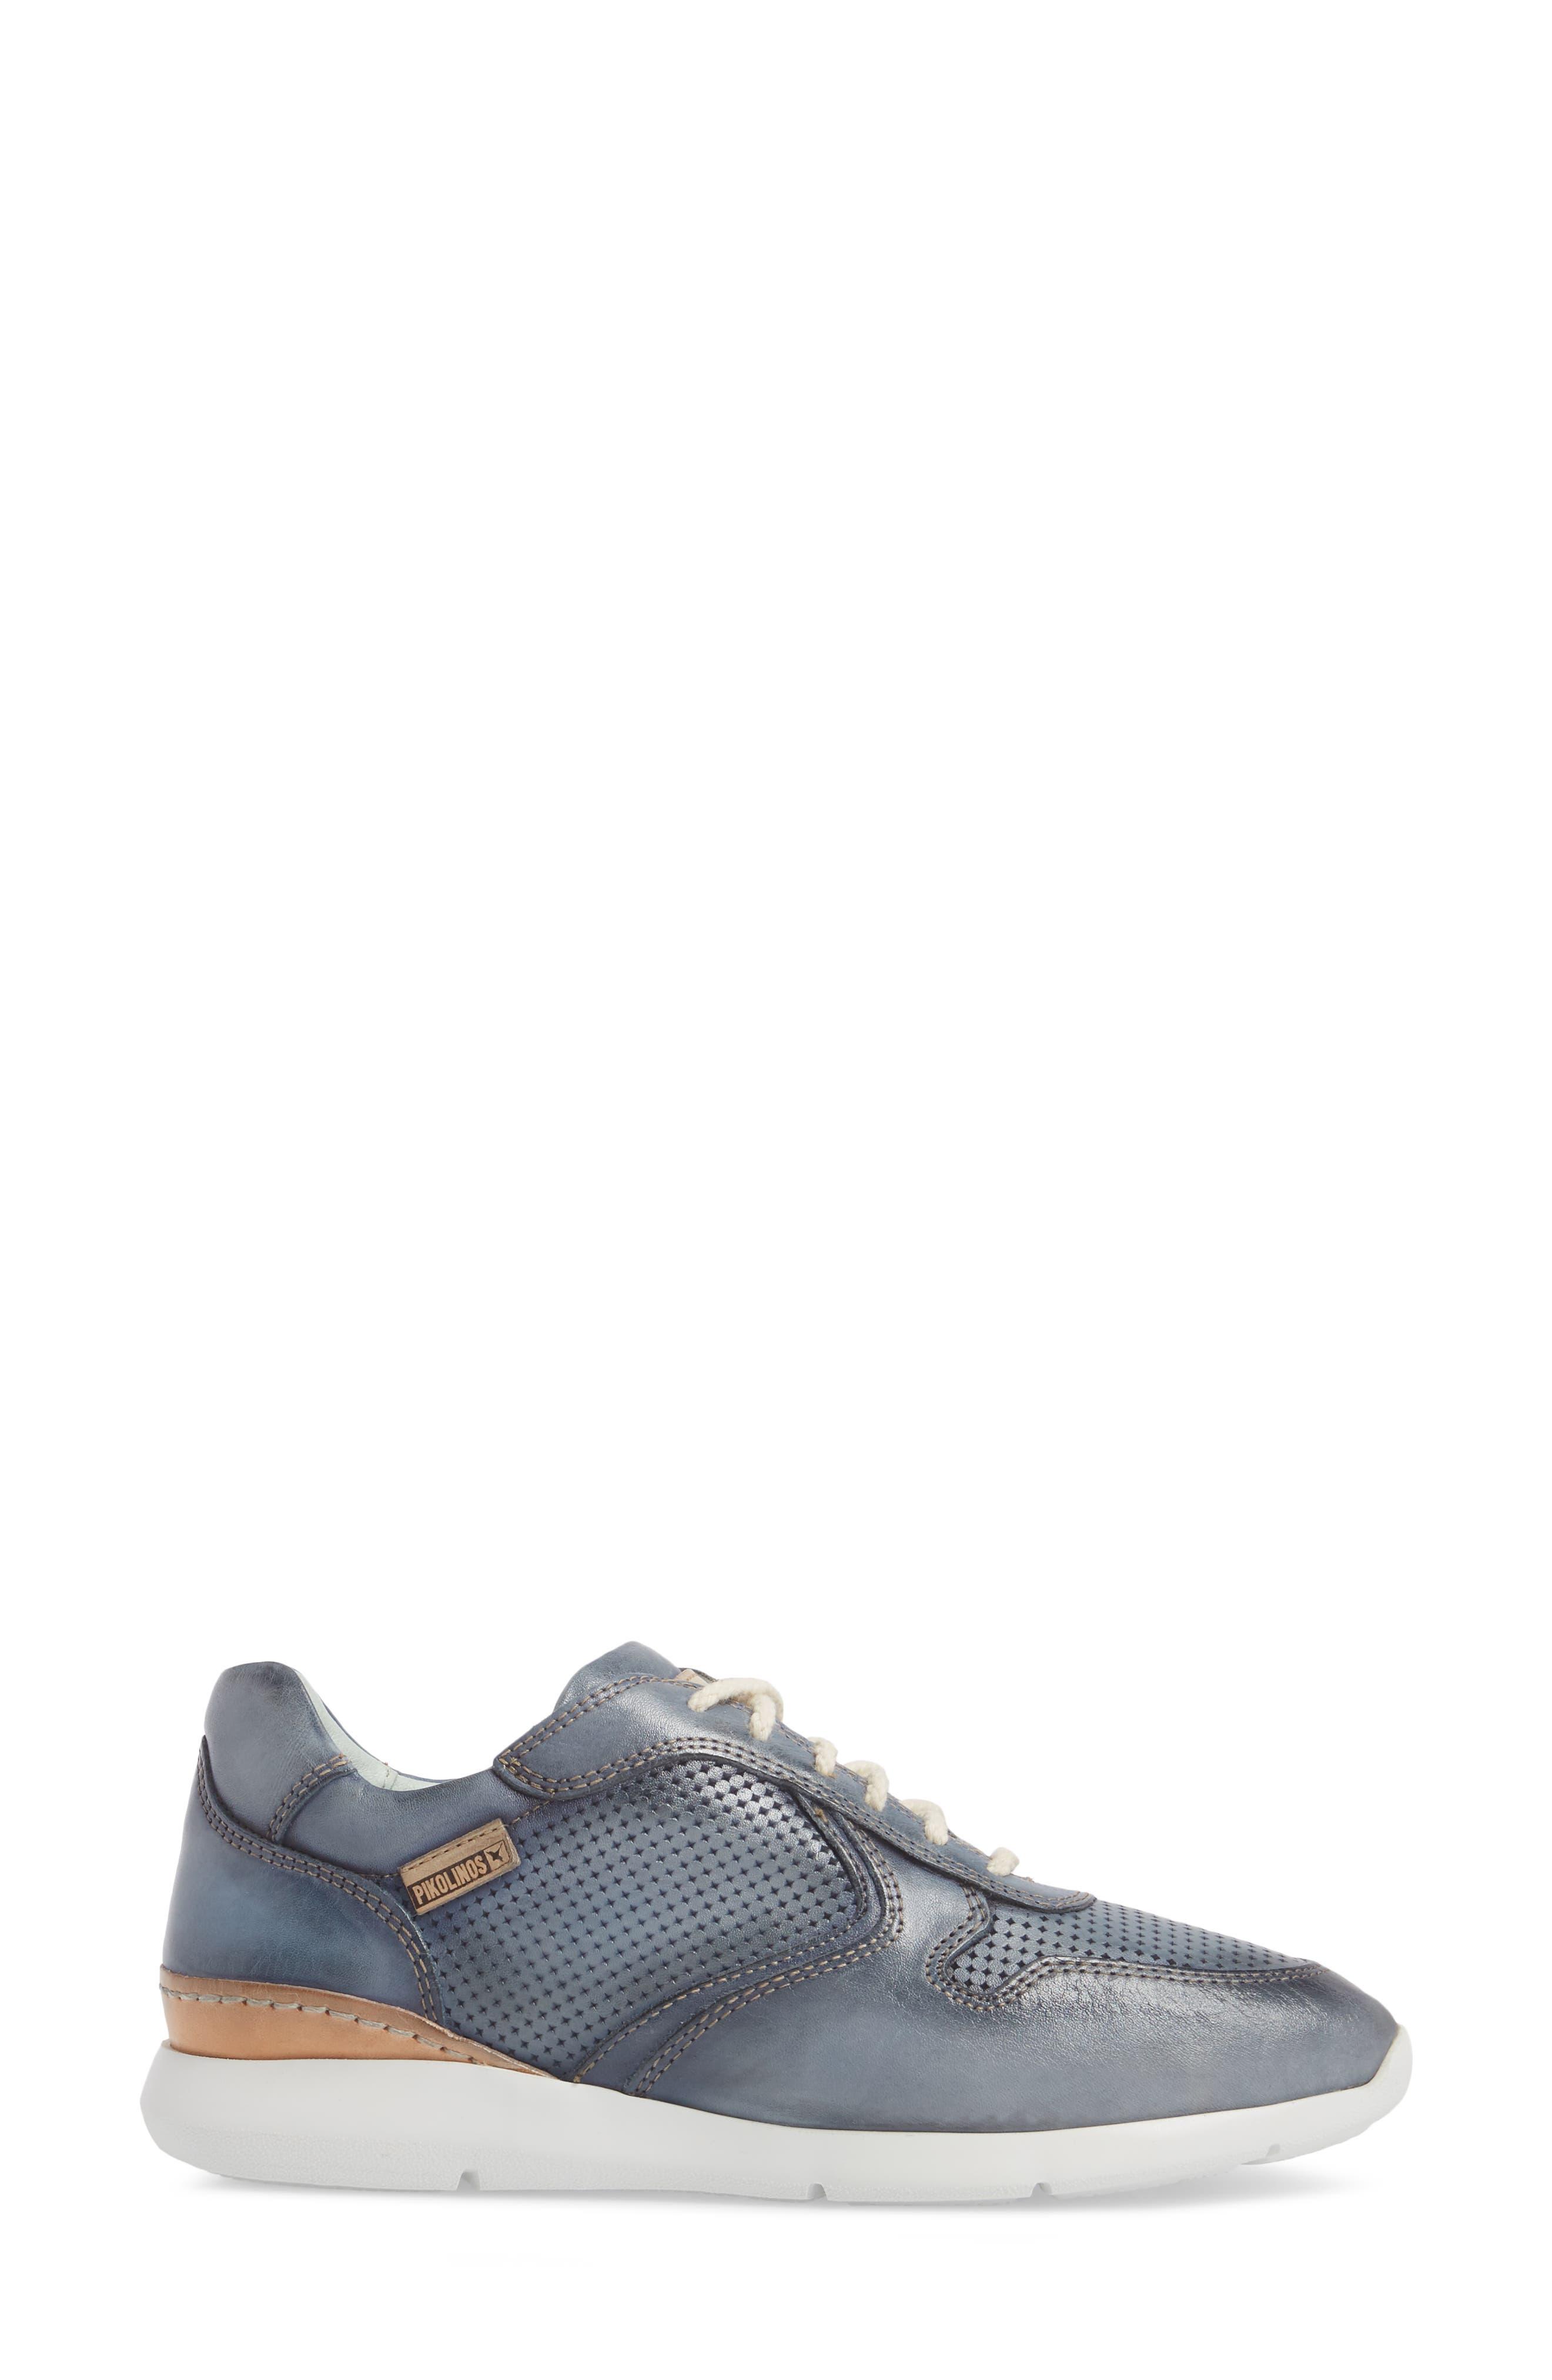 Modena Sneaker,                             Alternate thumbnail 3, color,                             400